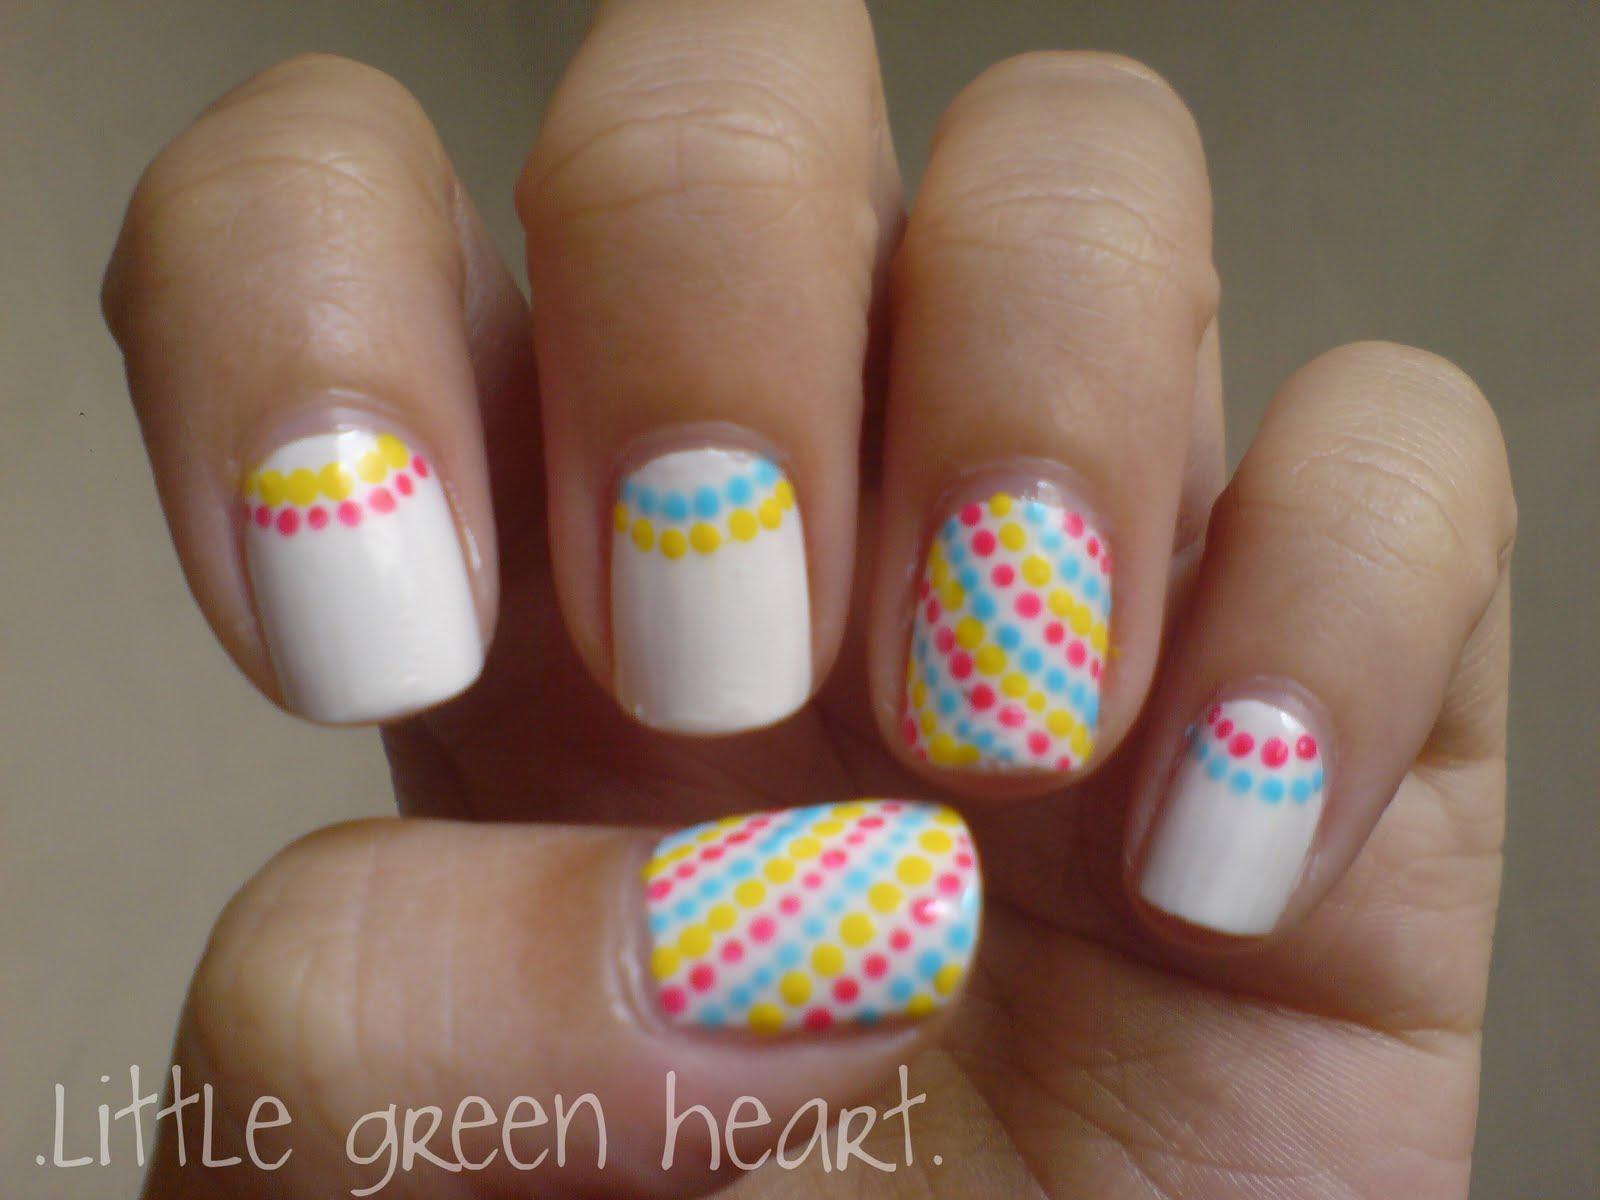 13 Simple But Cute Nail Designs Images Cute Nail Art Designs For Short Nails Cute Easy Summer Nail Designs And Cute Simple Nail Designs For Girls Newdesignfile Com